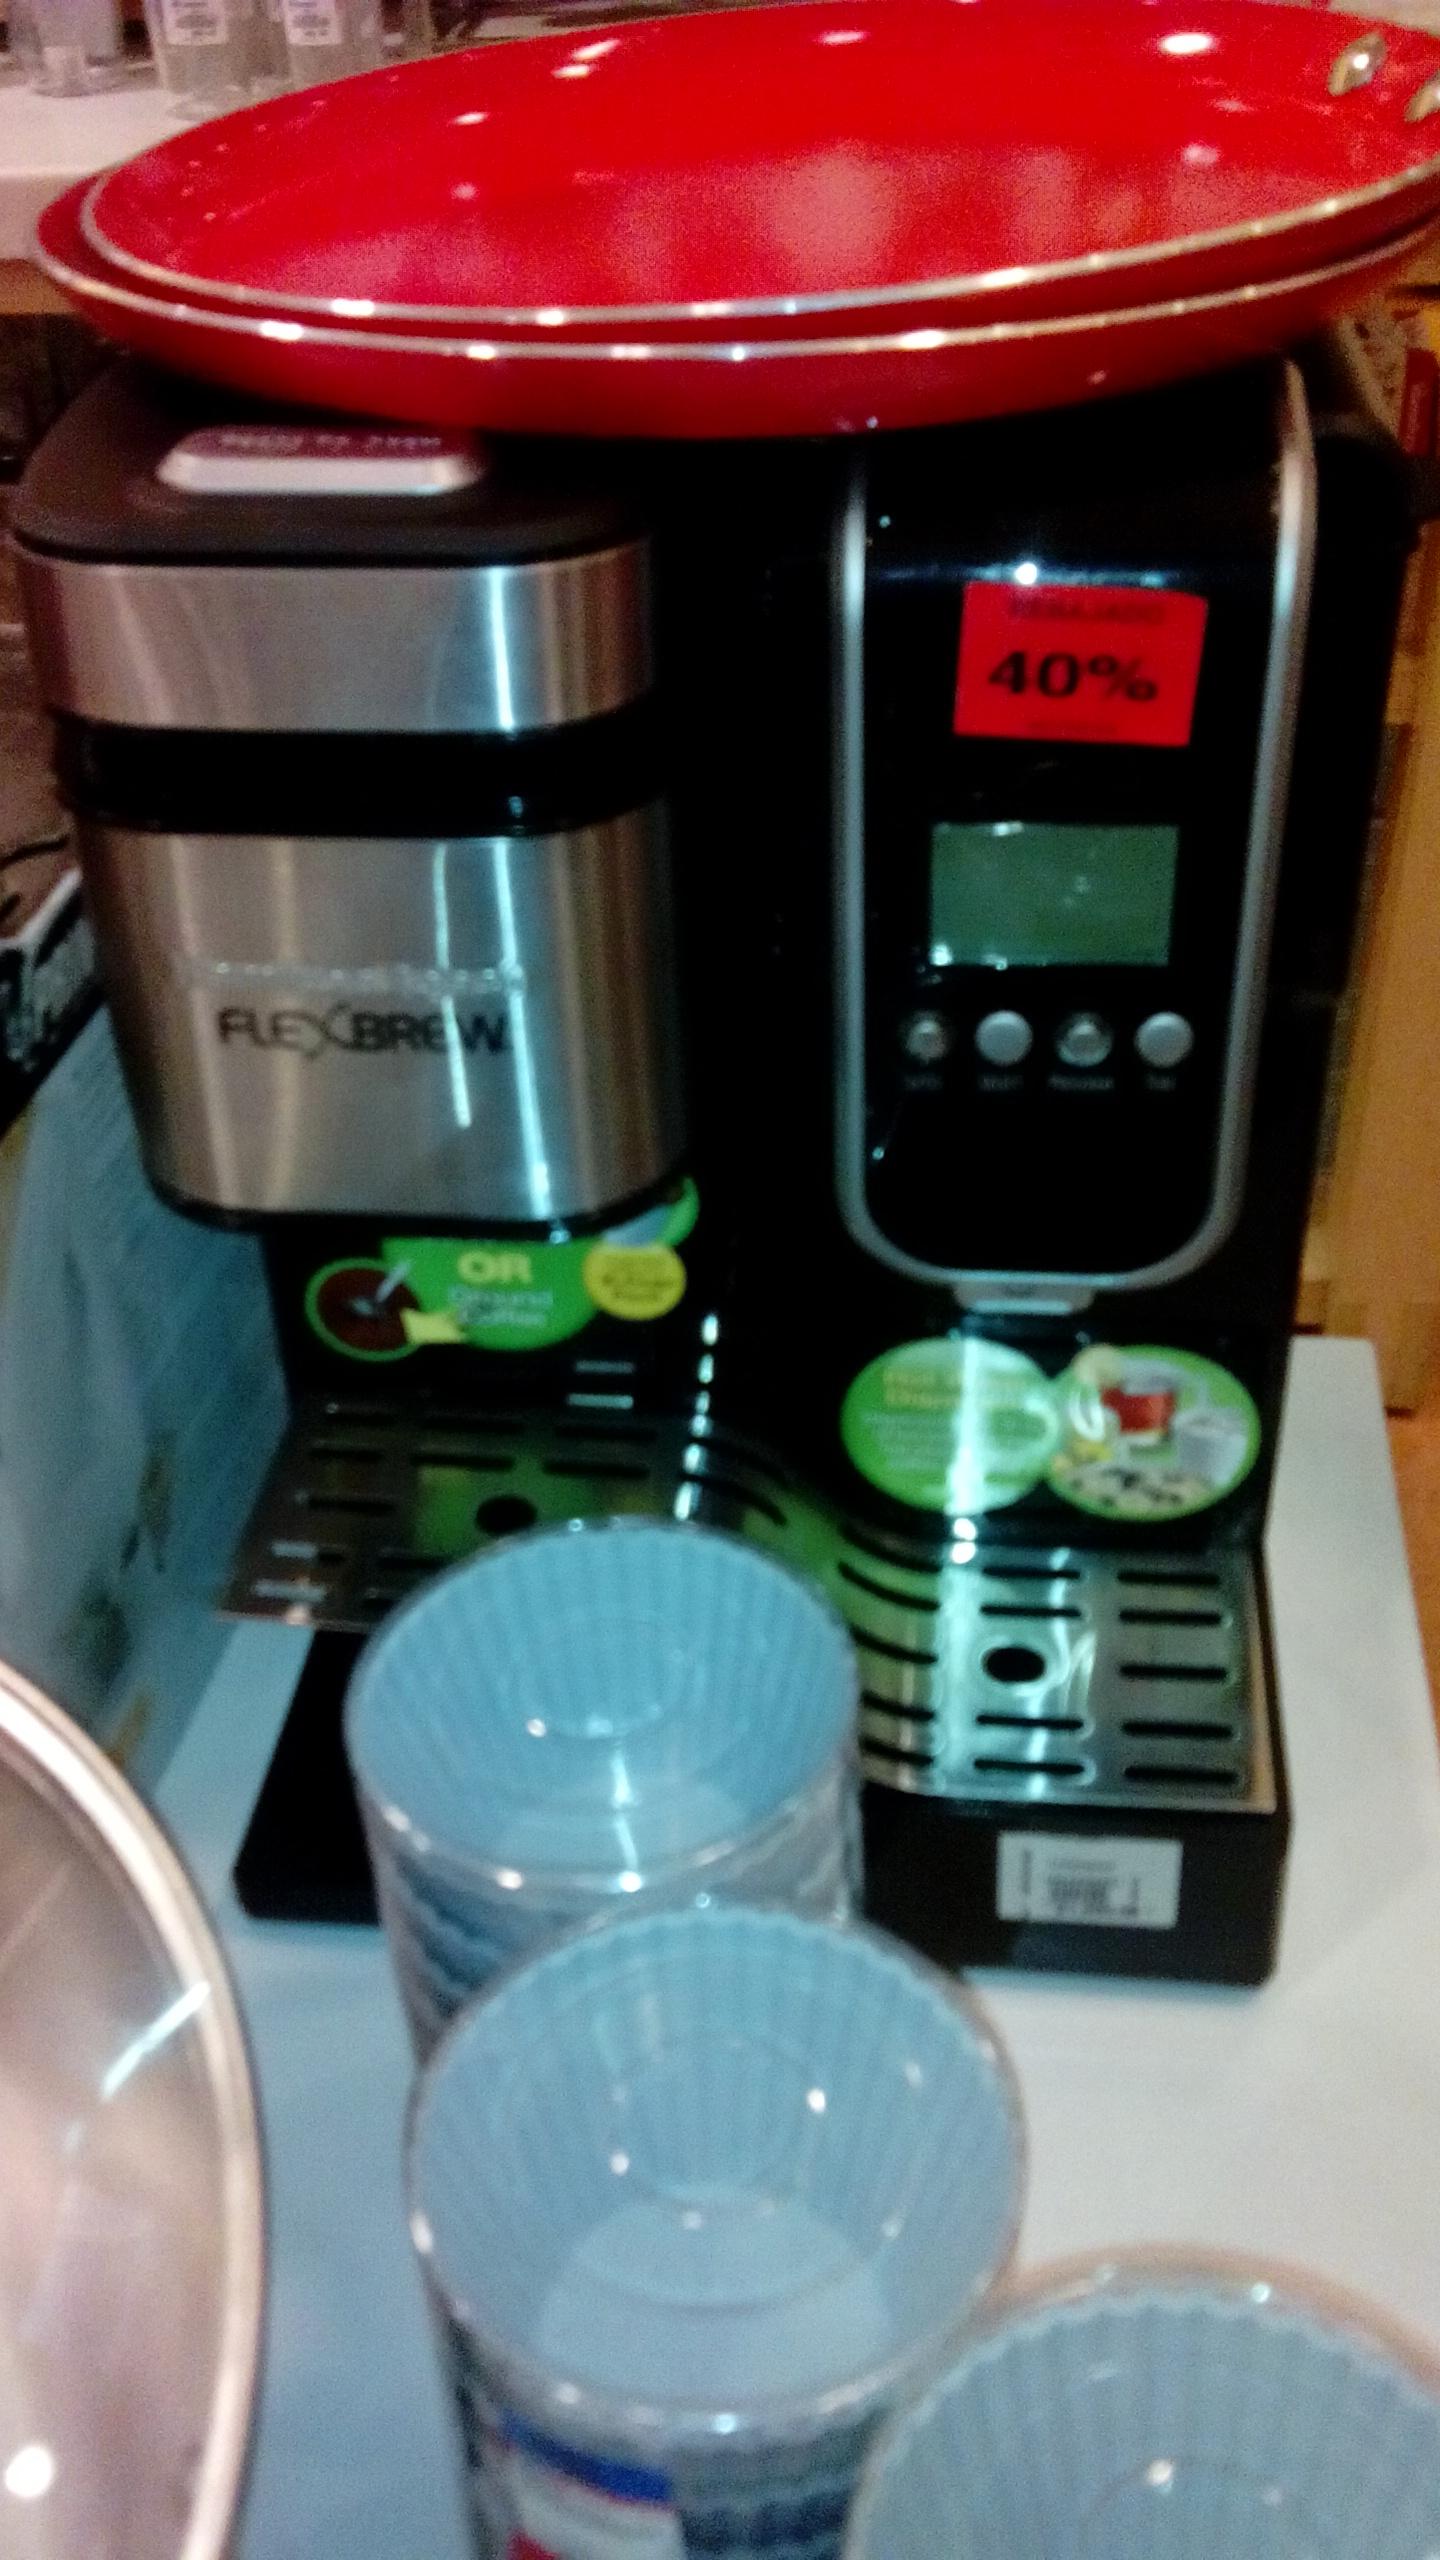 Liverpool: Cafetera y calentador de agua Hamilton Beach a $815.40